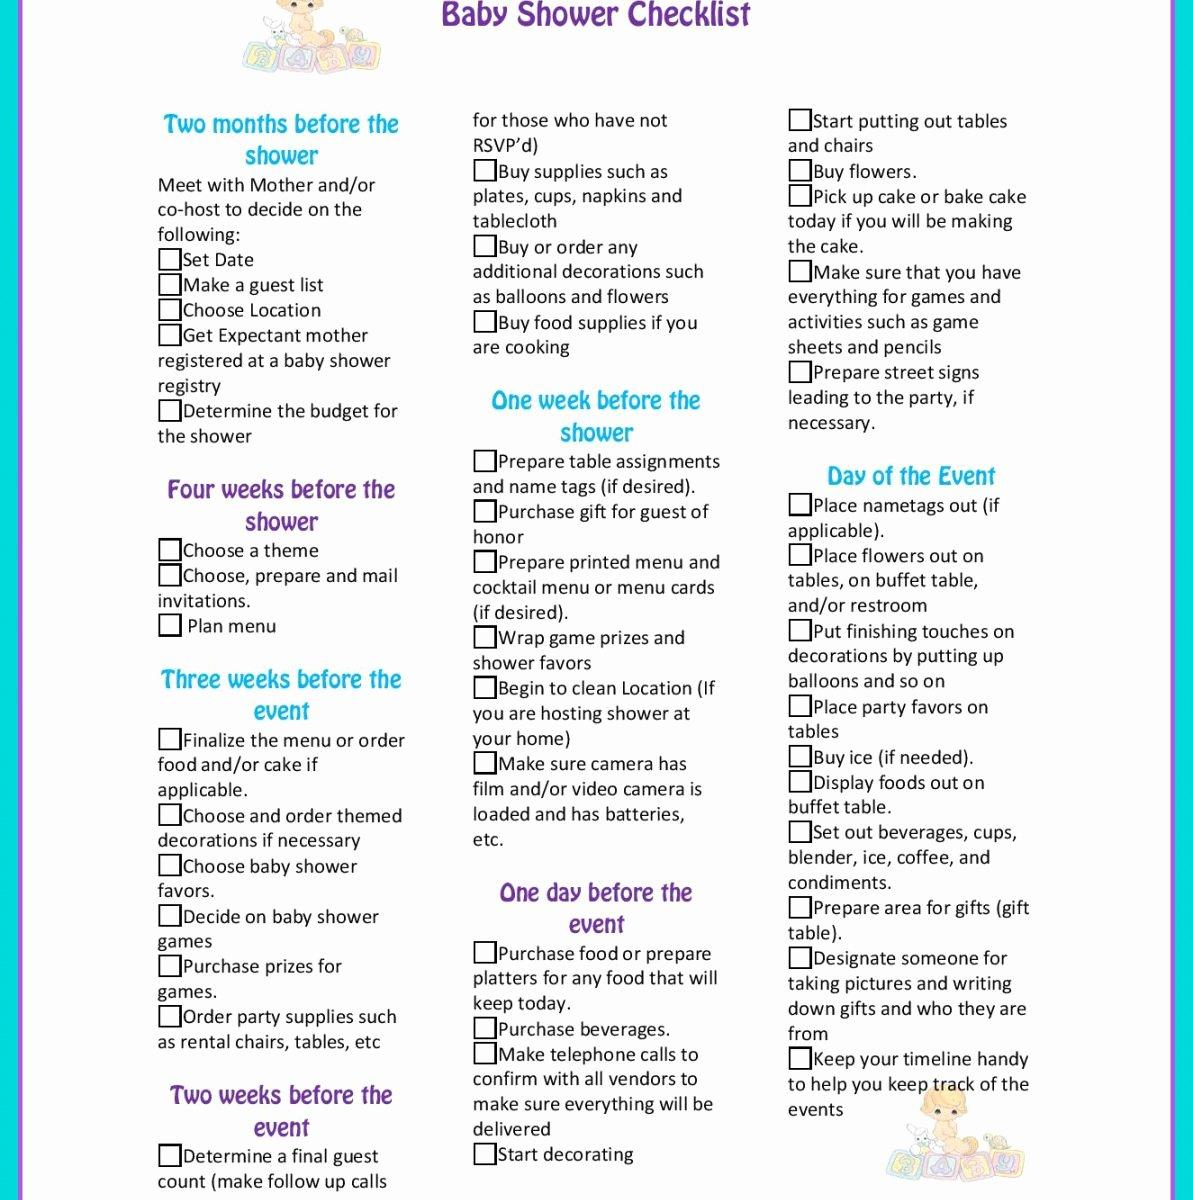 Baby Shower Program Sample Inspirational Baby Shower Program Sample Red 8 5x11 Agenda Example